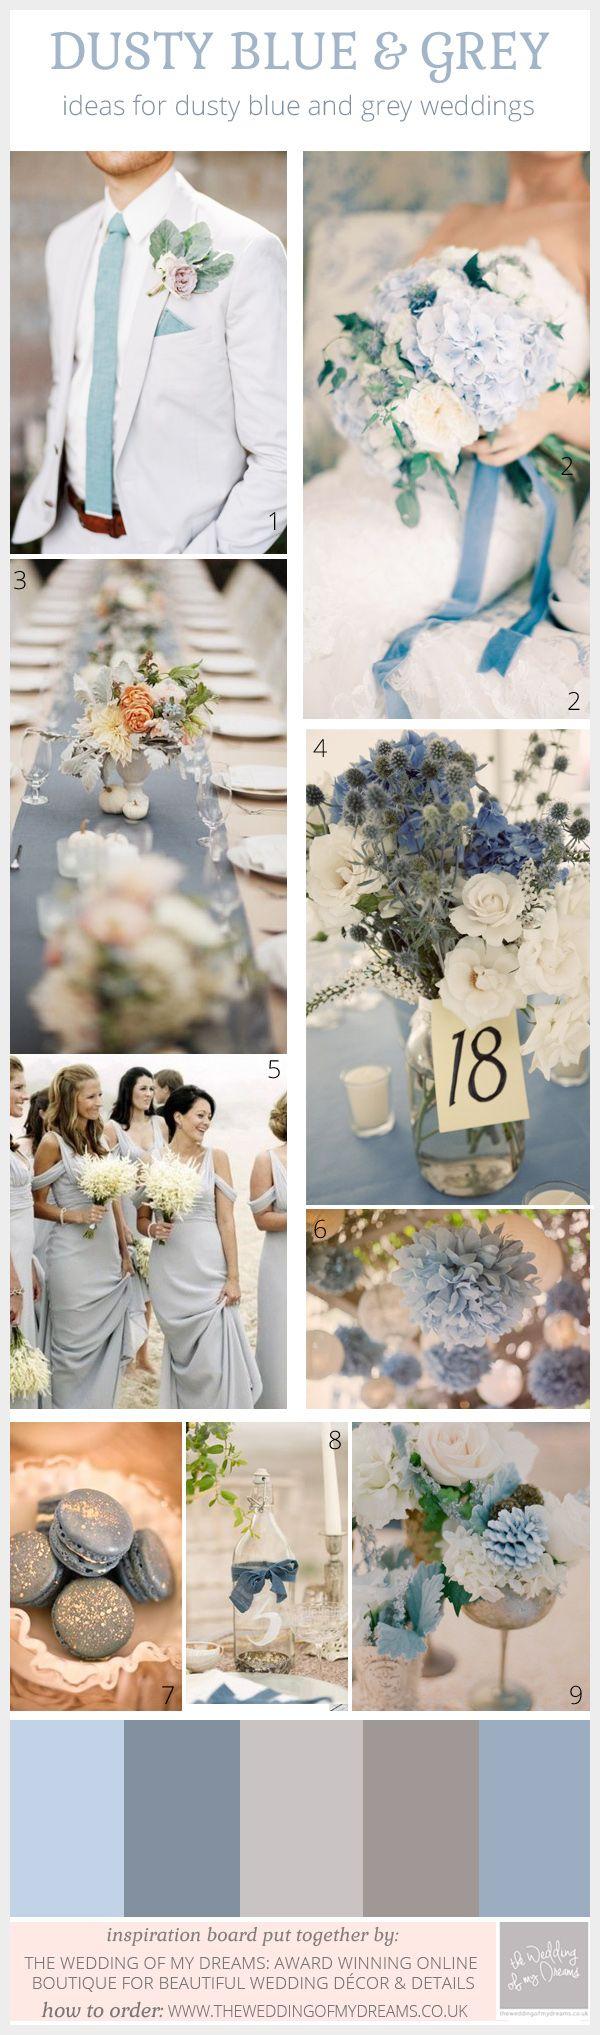 Dusty Blue And Grey Wedding Ideas and Inspiration @theweddingomd